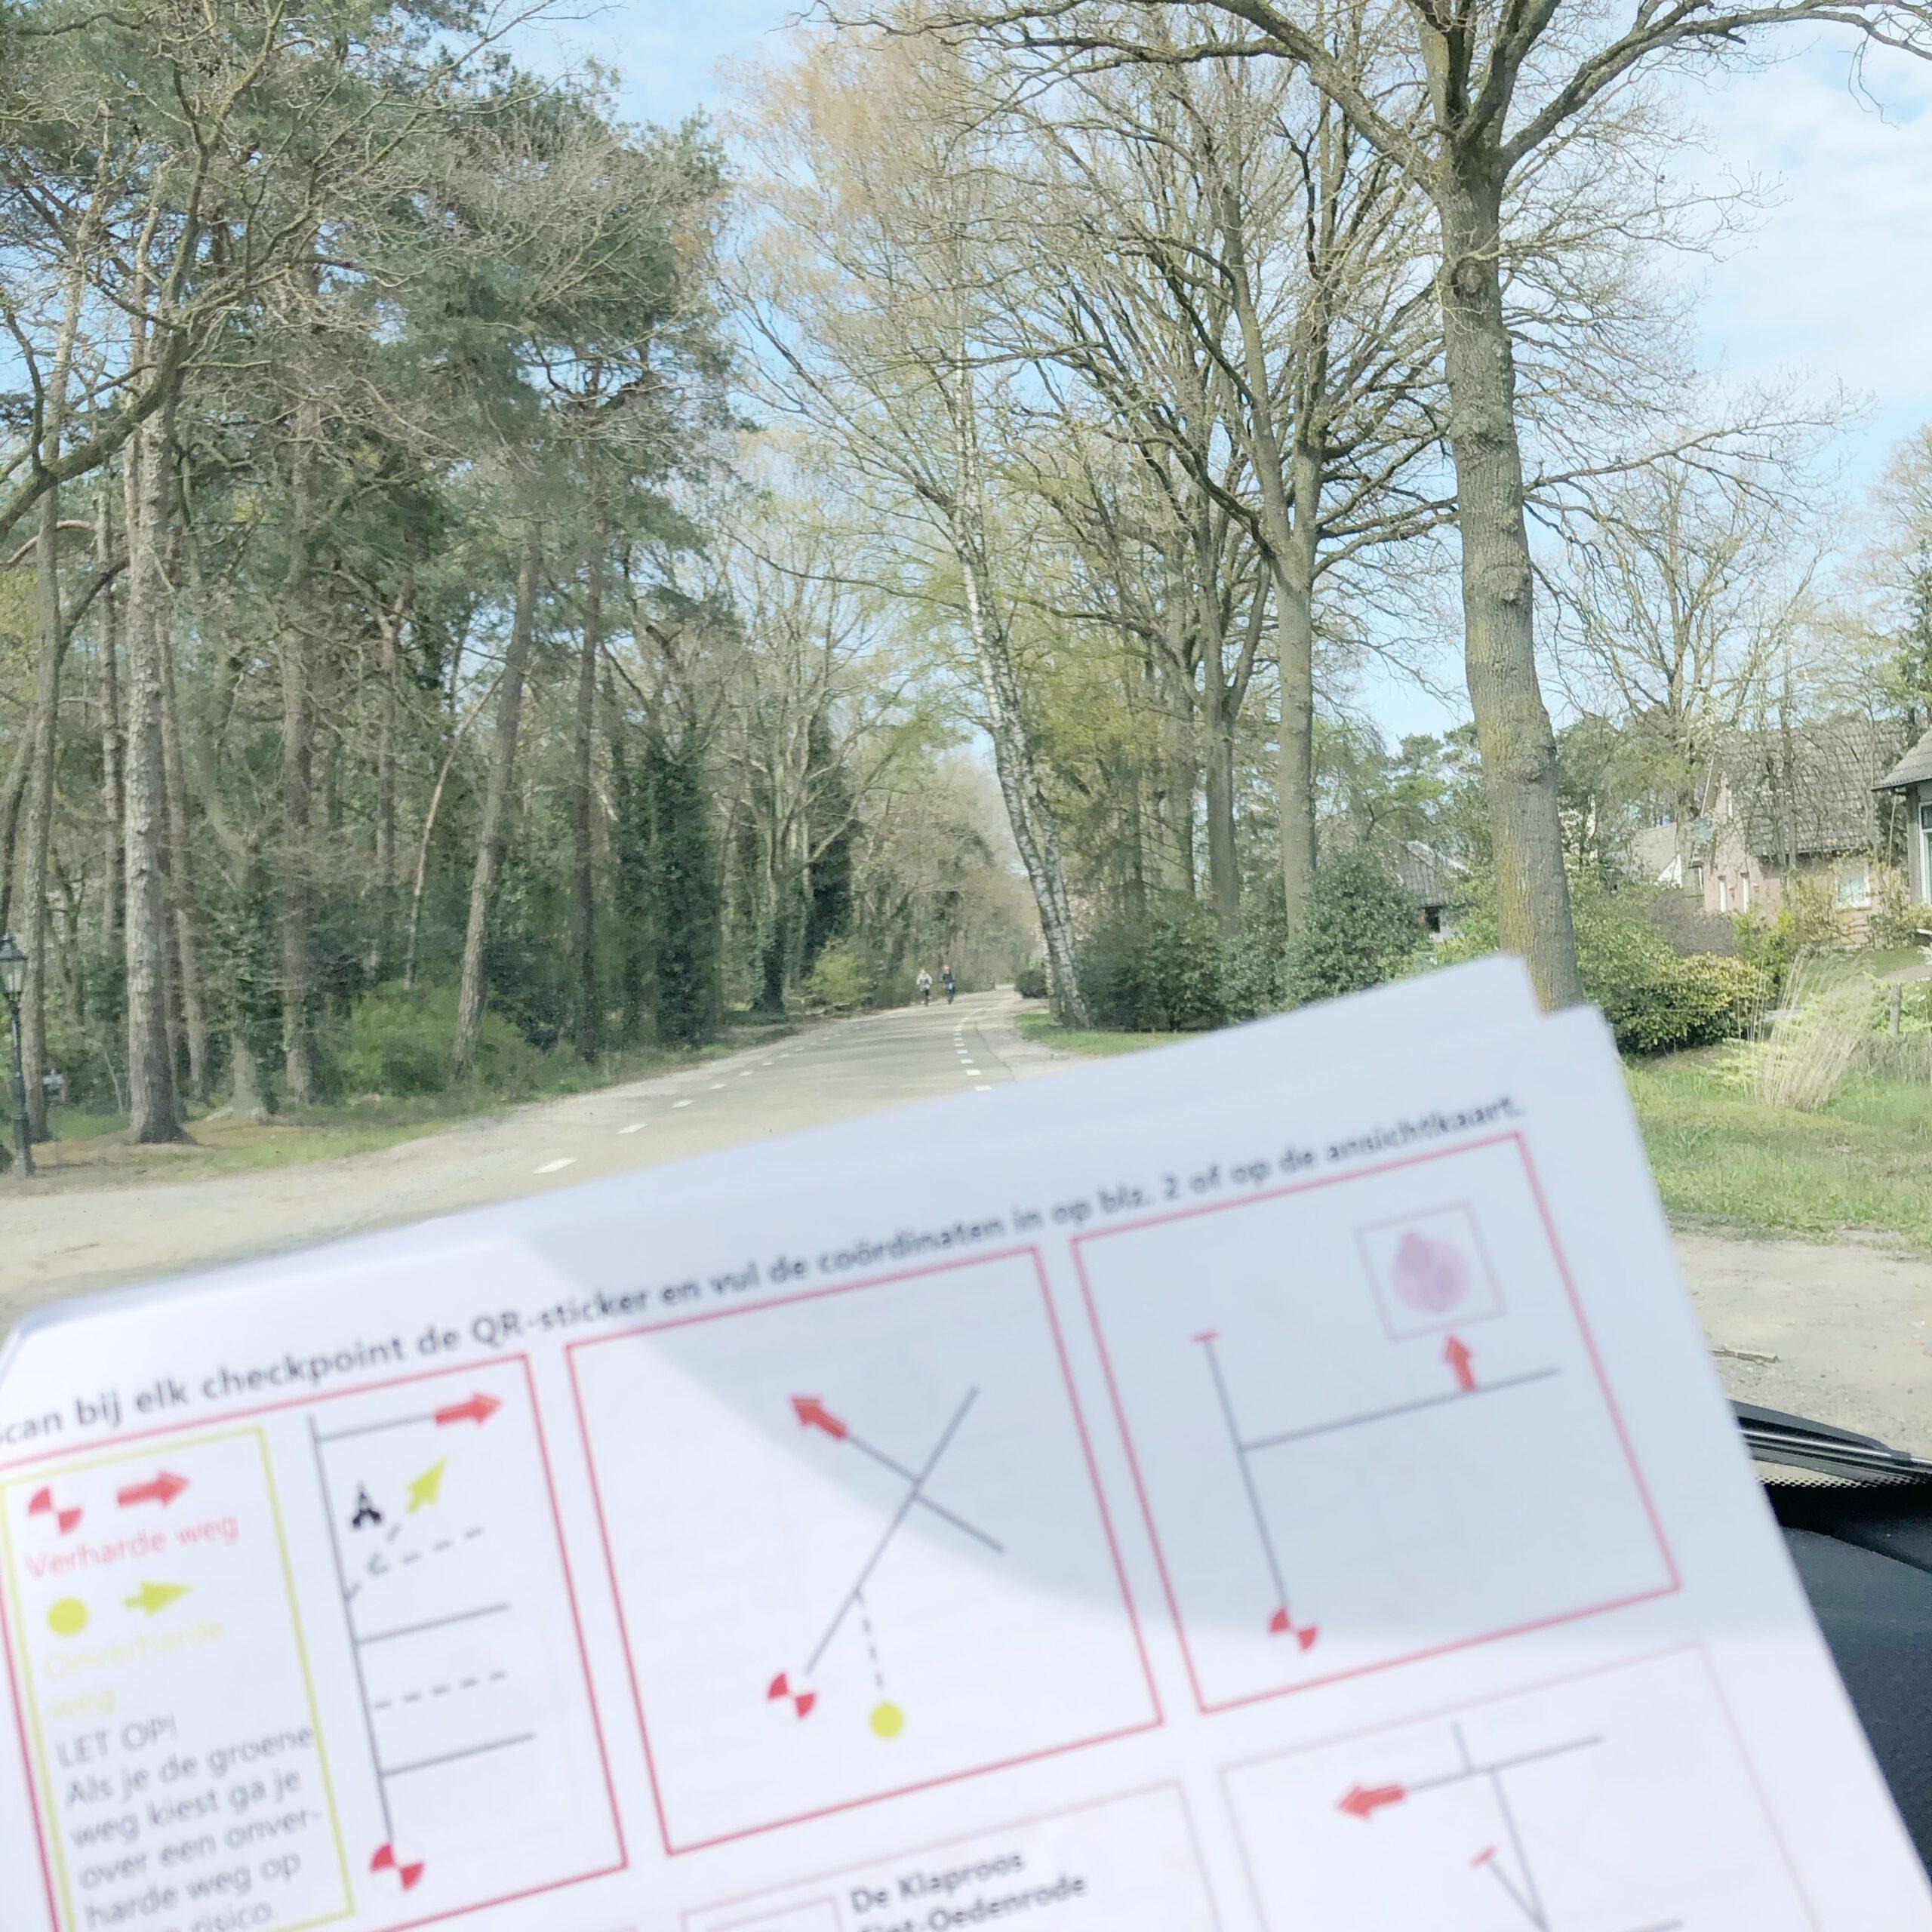 leuk uitje in Brabant: keigave autospeurtocht - banner